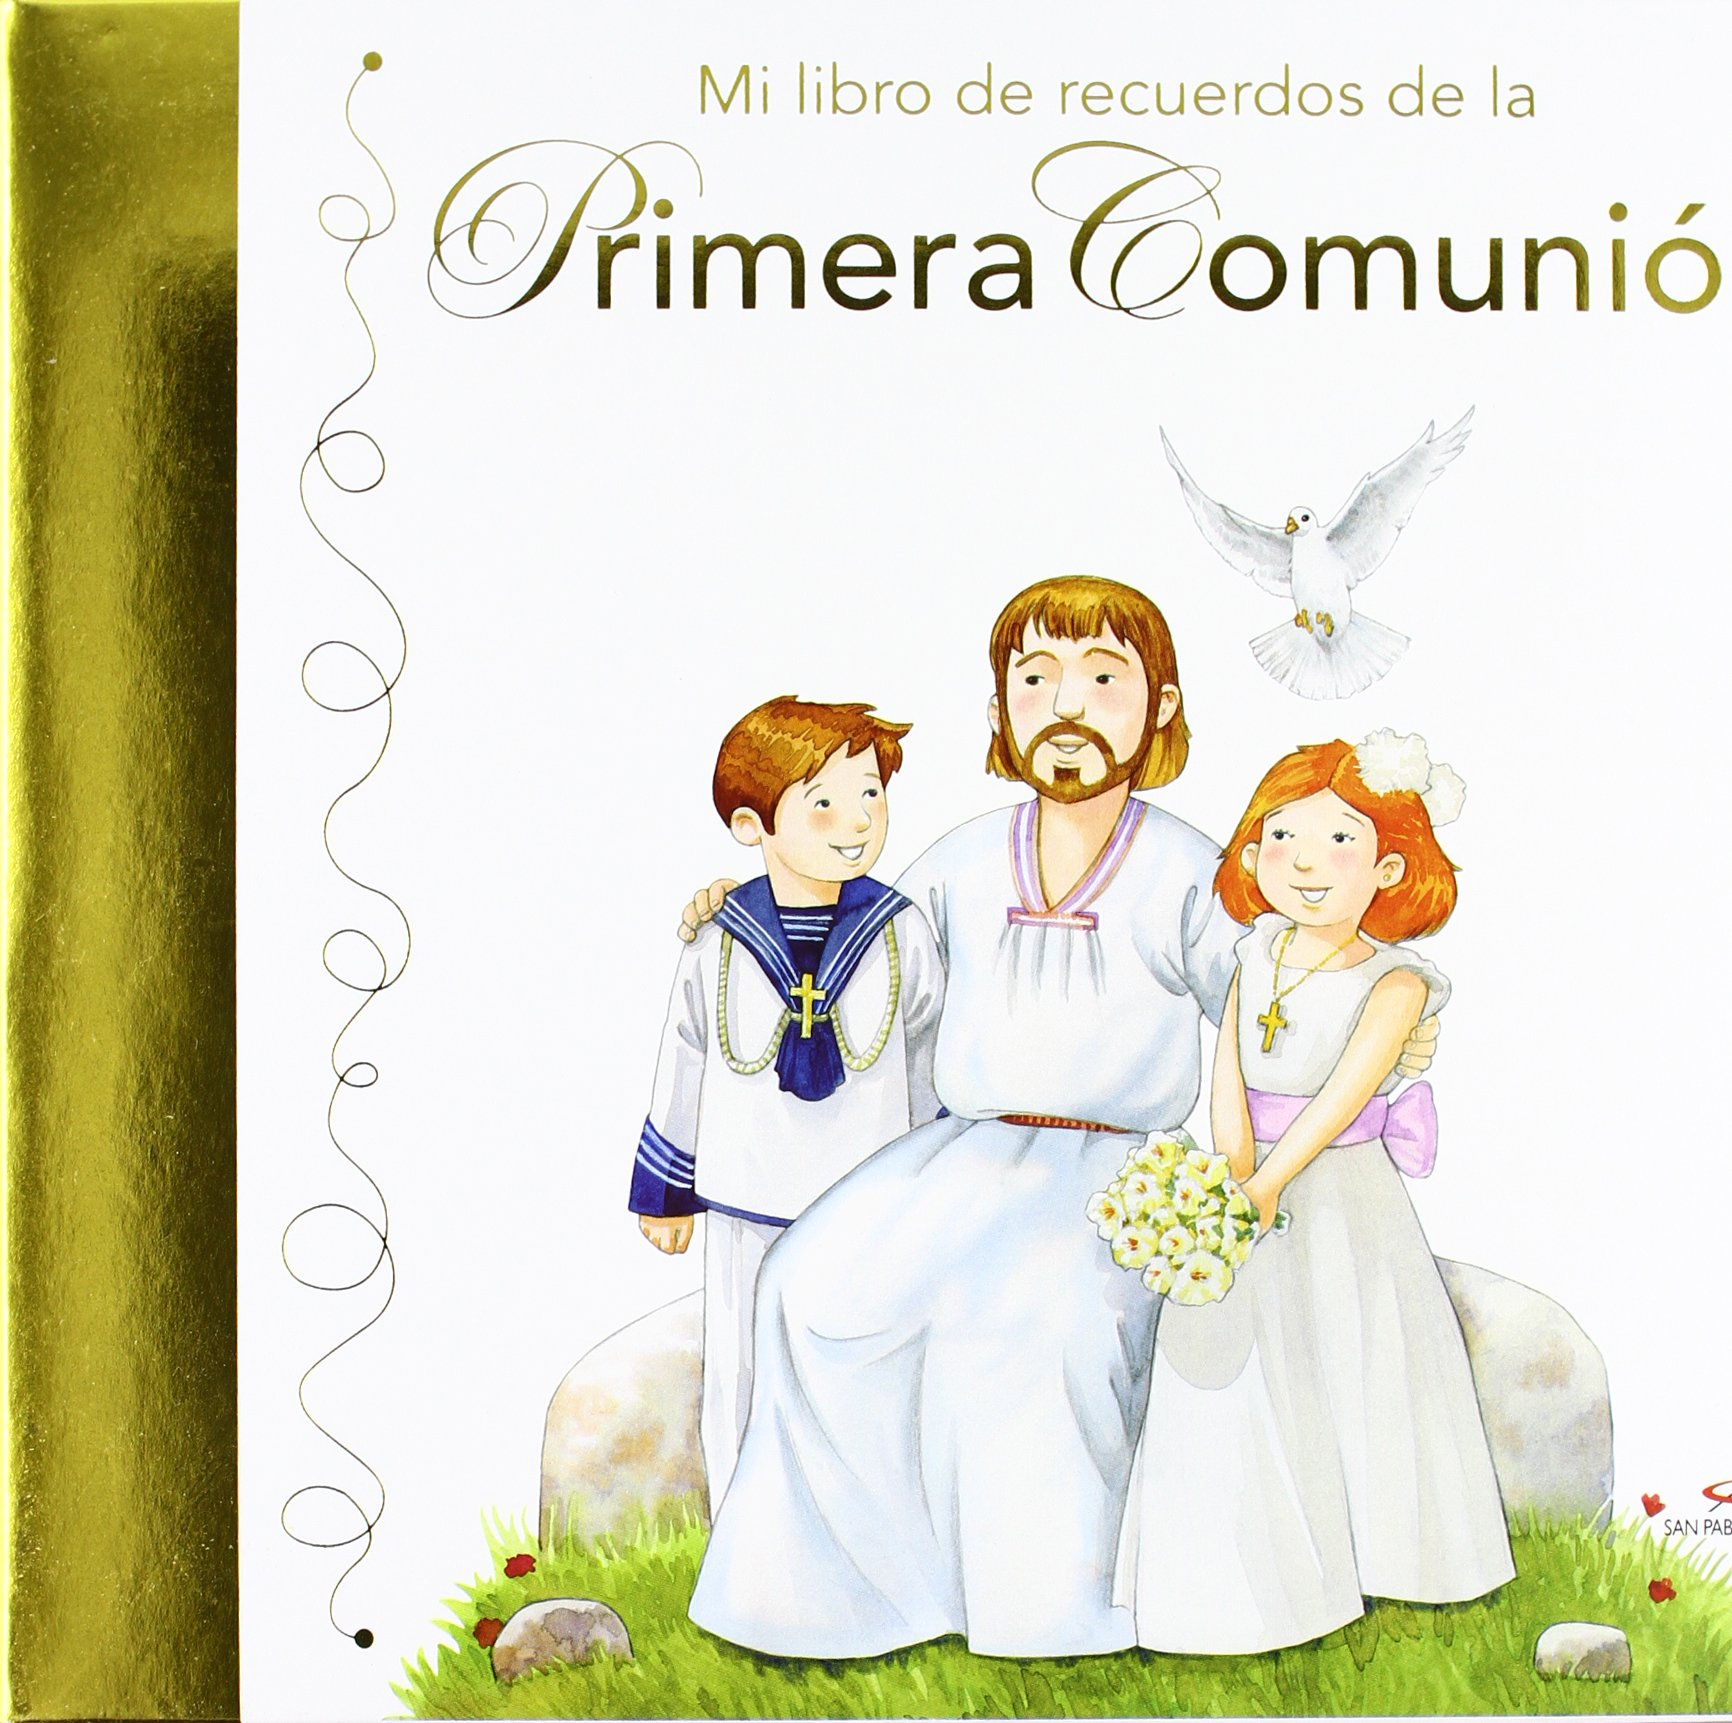 59b50941e05 Mi libro de recuerdos de la primera comunión (Spanish) Hardcover – February  1